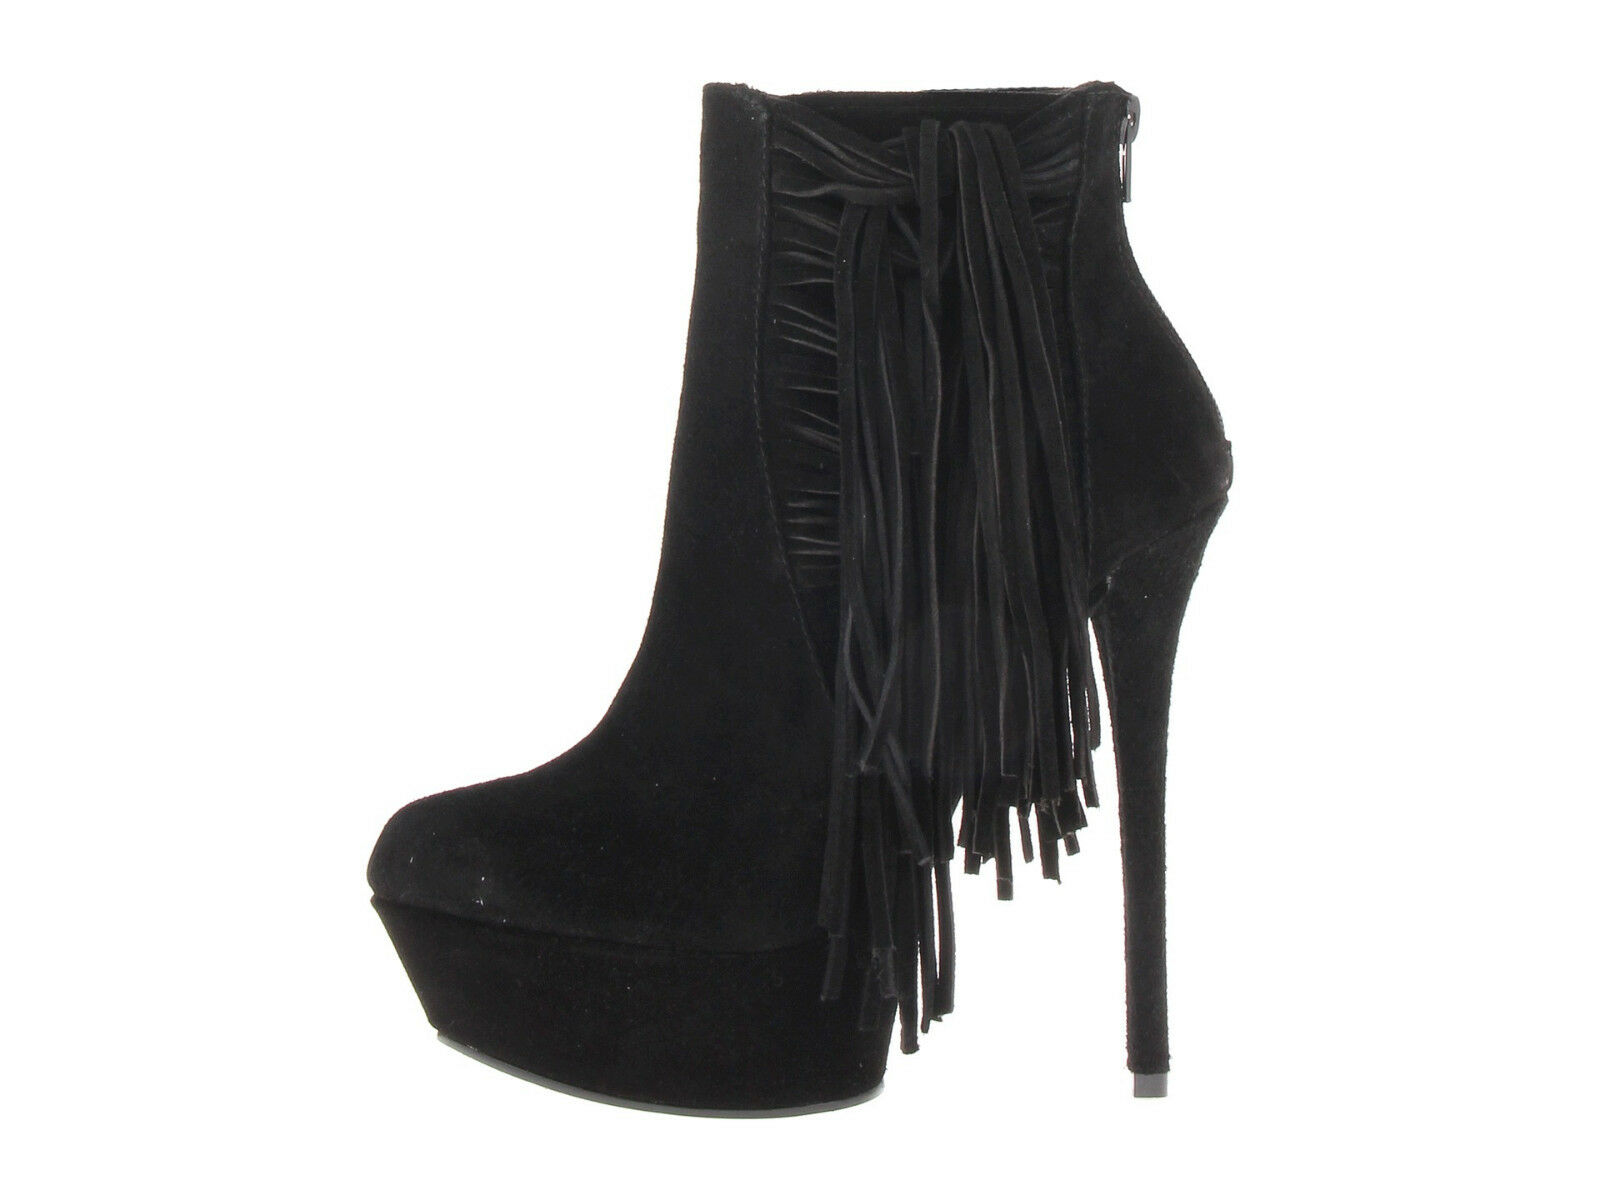 NEW STEVE MADDEN 169 BLACK SUEDE LEATHER ARAURA BOOTS Schuhe SZ 8